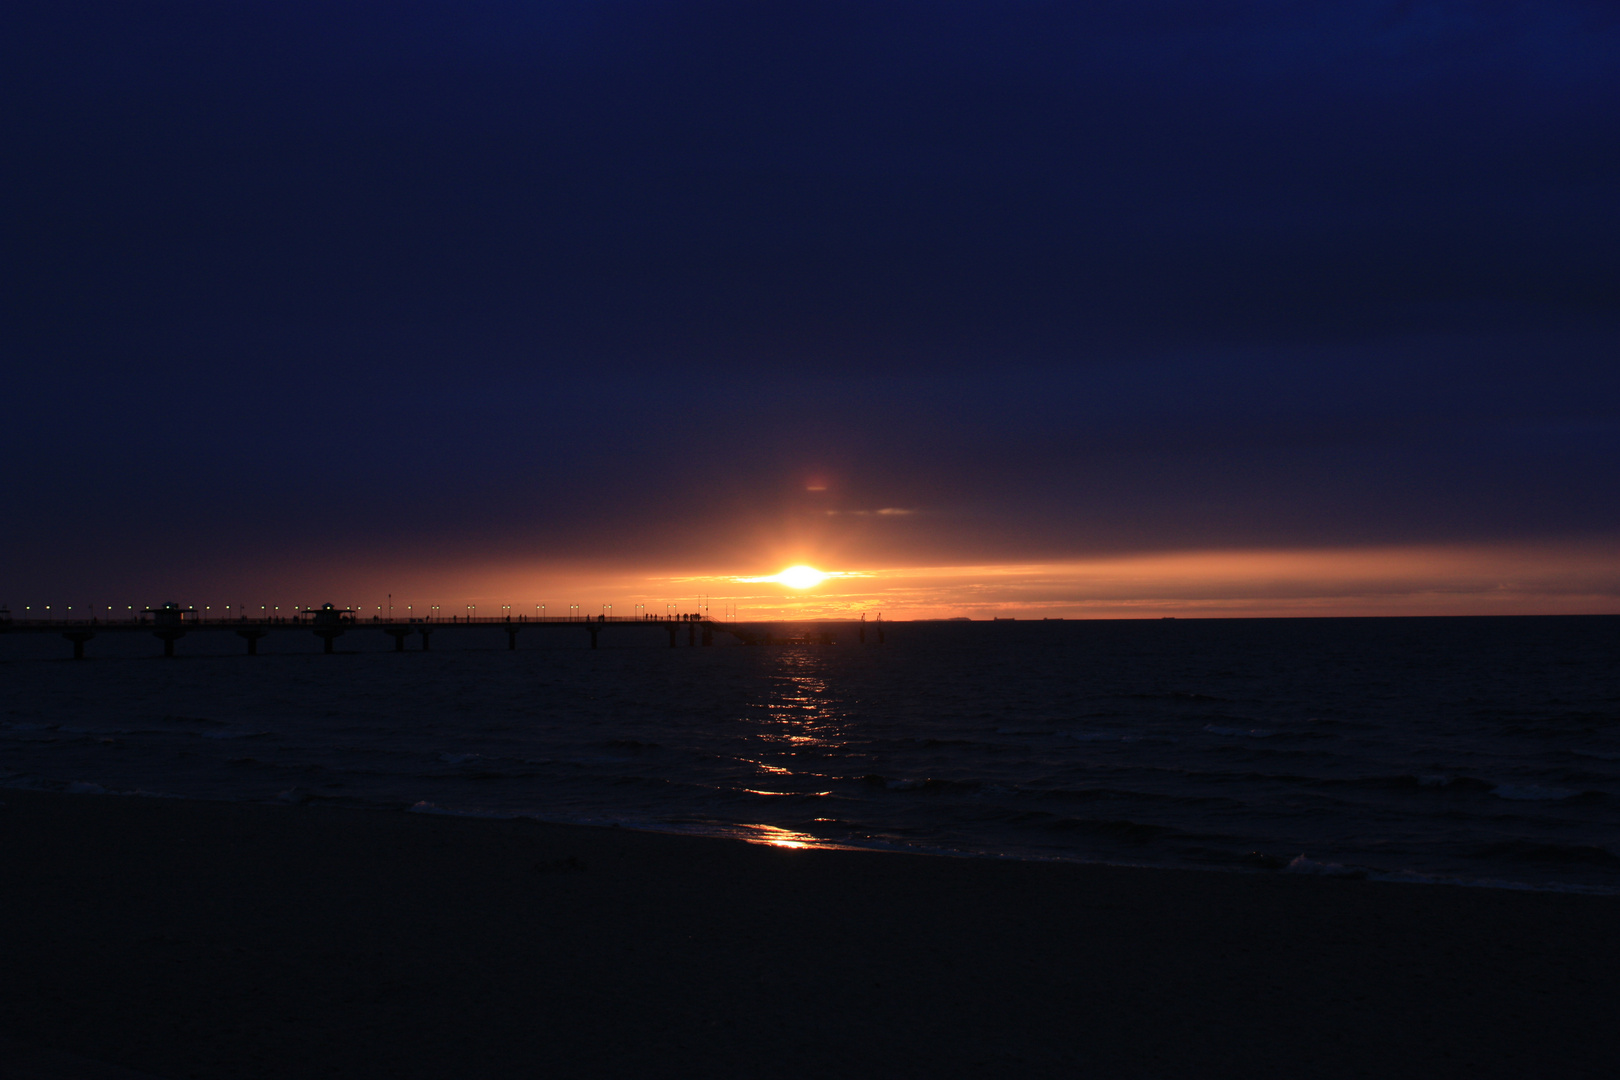 Sonnenuntergang vor Usedom